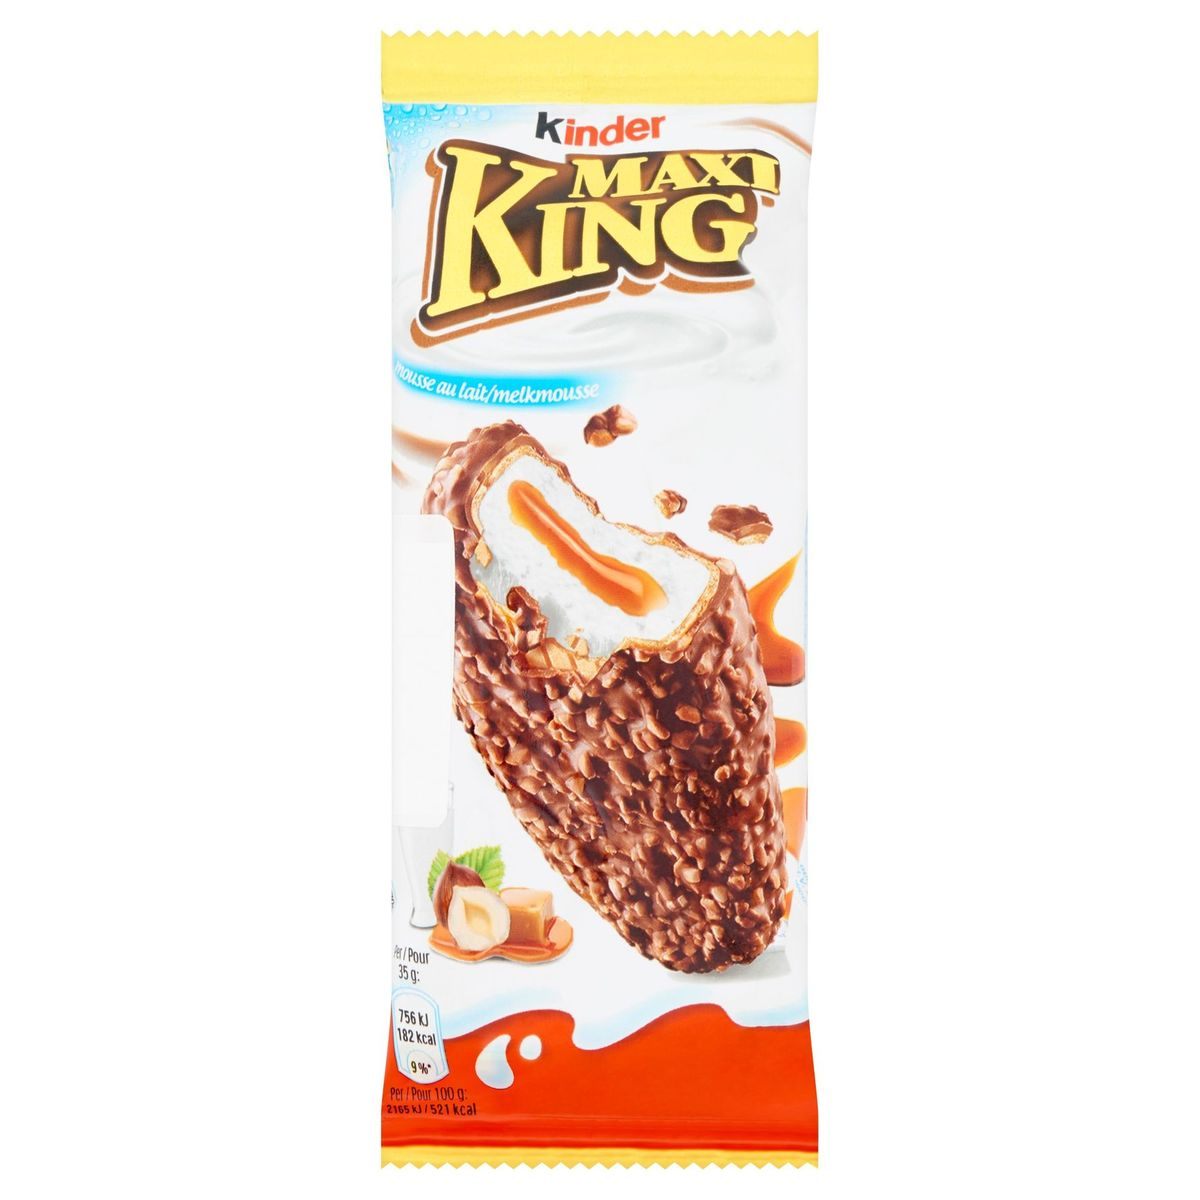 Kinder Maxi King 3 x 35 g